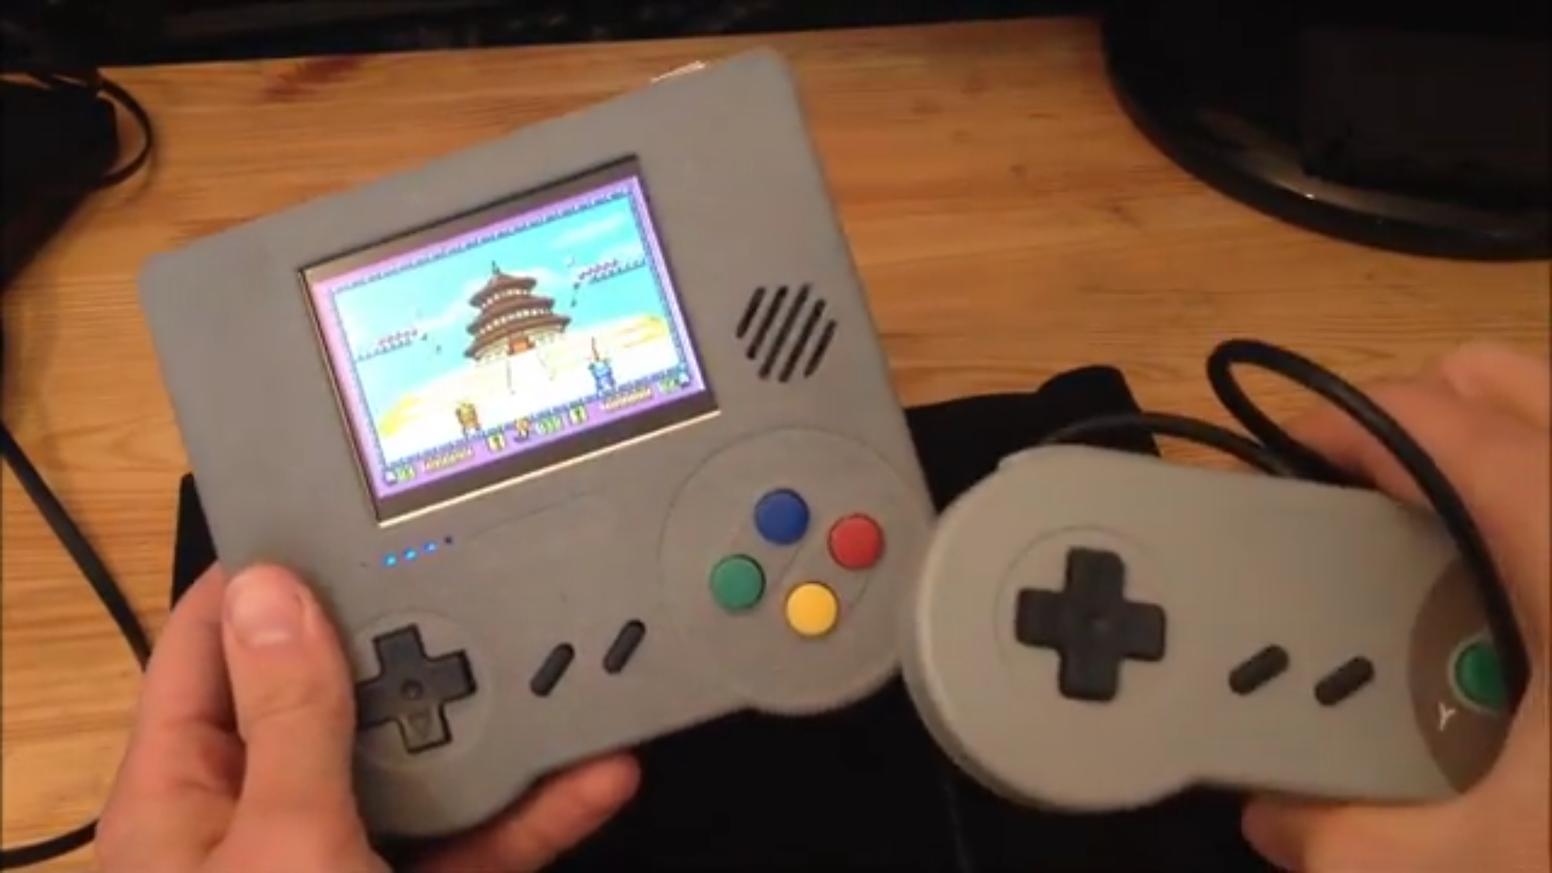 Raspi boy retro handheld emulation console electronic kit by pierre louis boyer kickstarter - Retro game emulator console ...